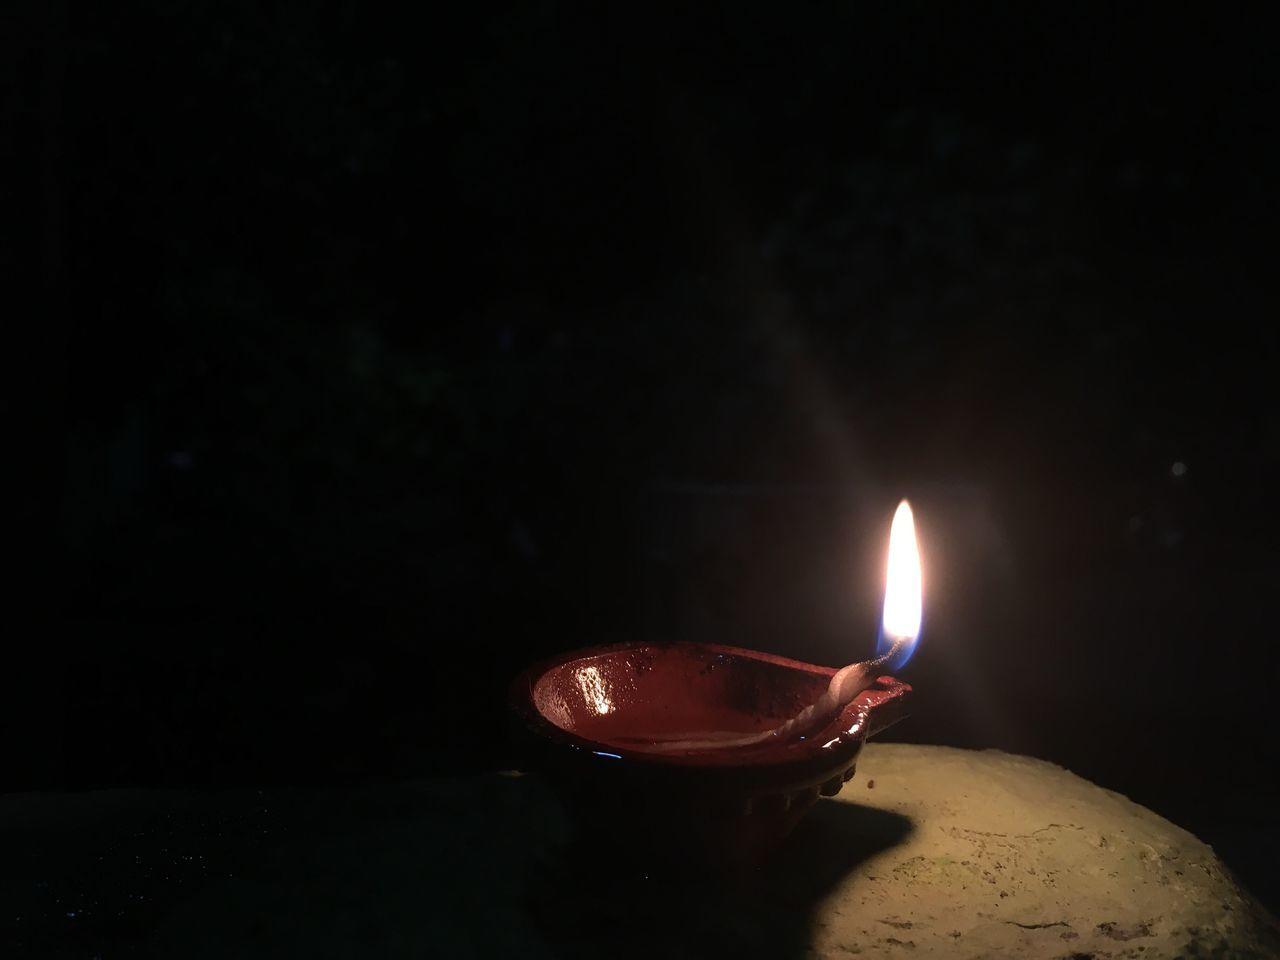 burning, flame, heat - temperature, candle, diya - oil lamp, close-up, no people, oil lamp, illuminated, night, diwali, indoors, black background